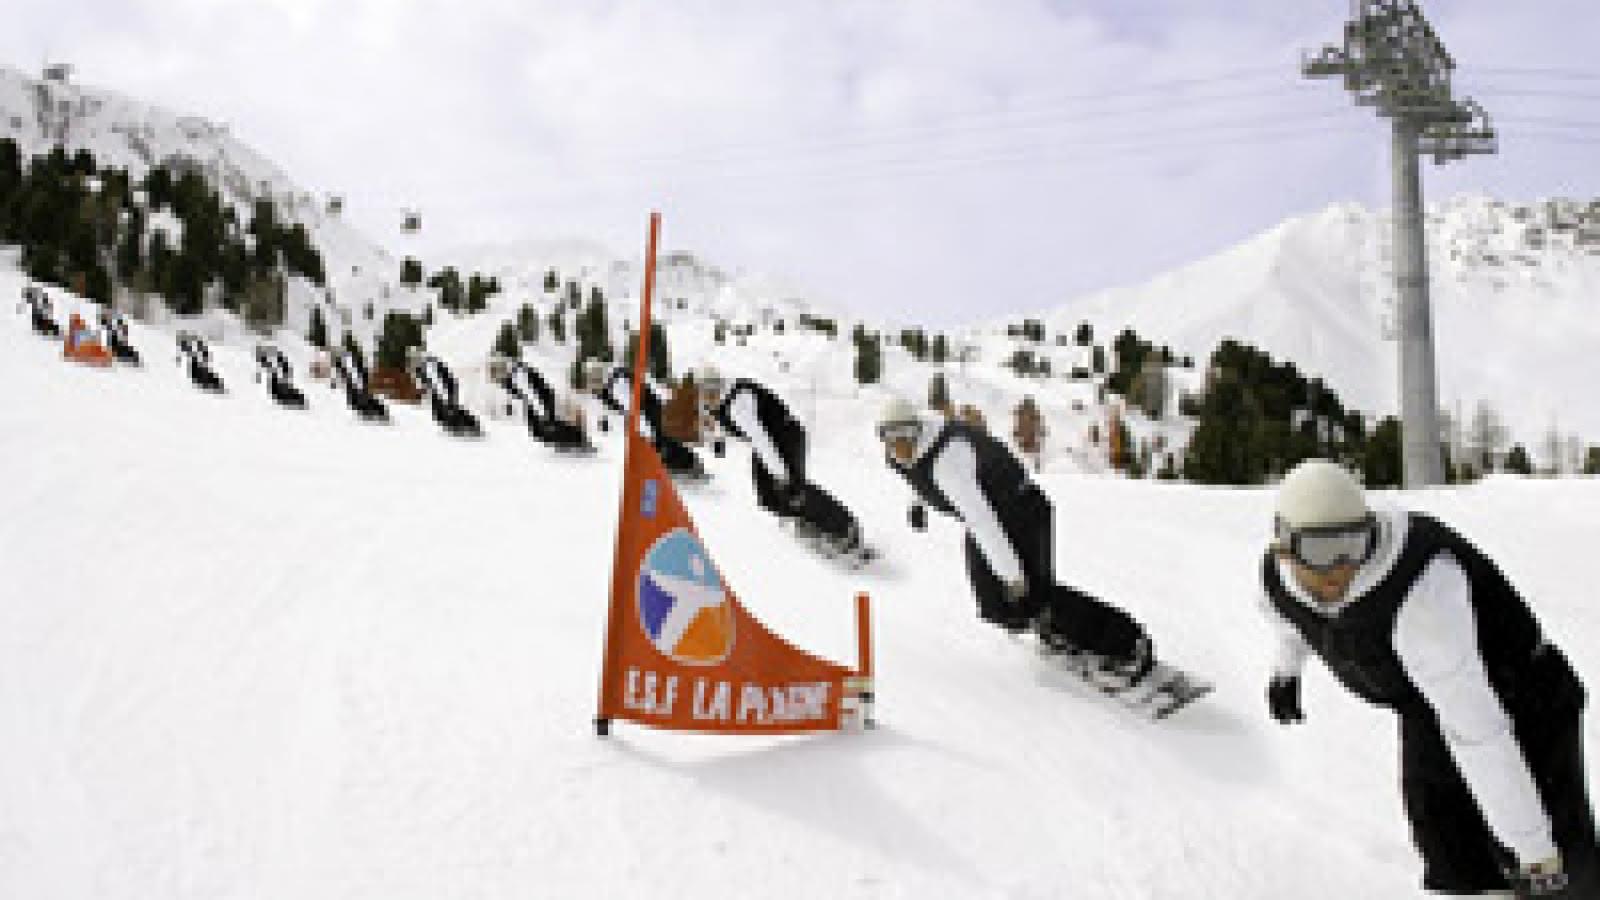 Border cross - ski cross - la Plagne